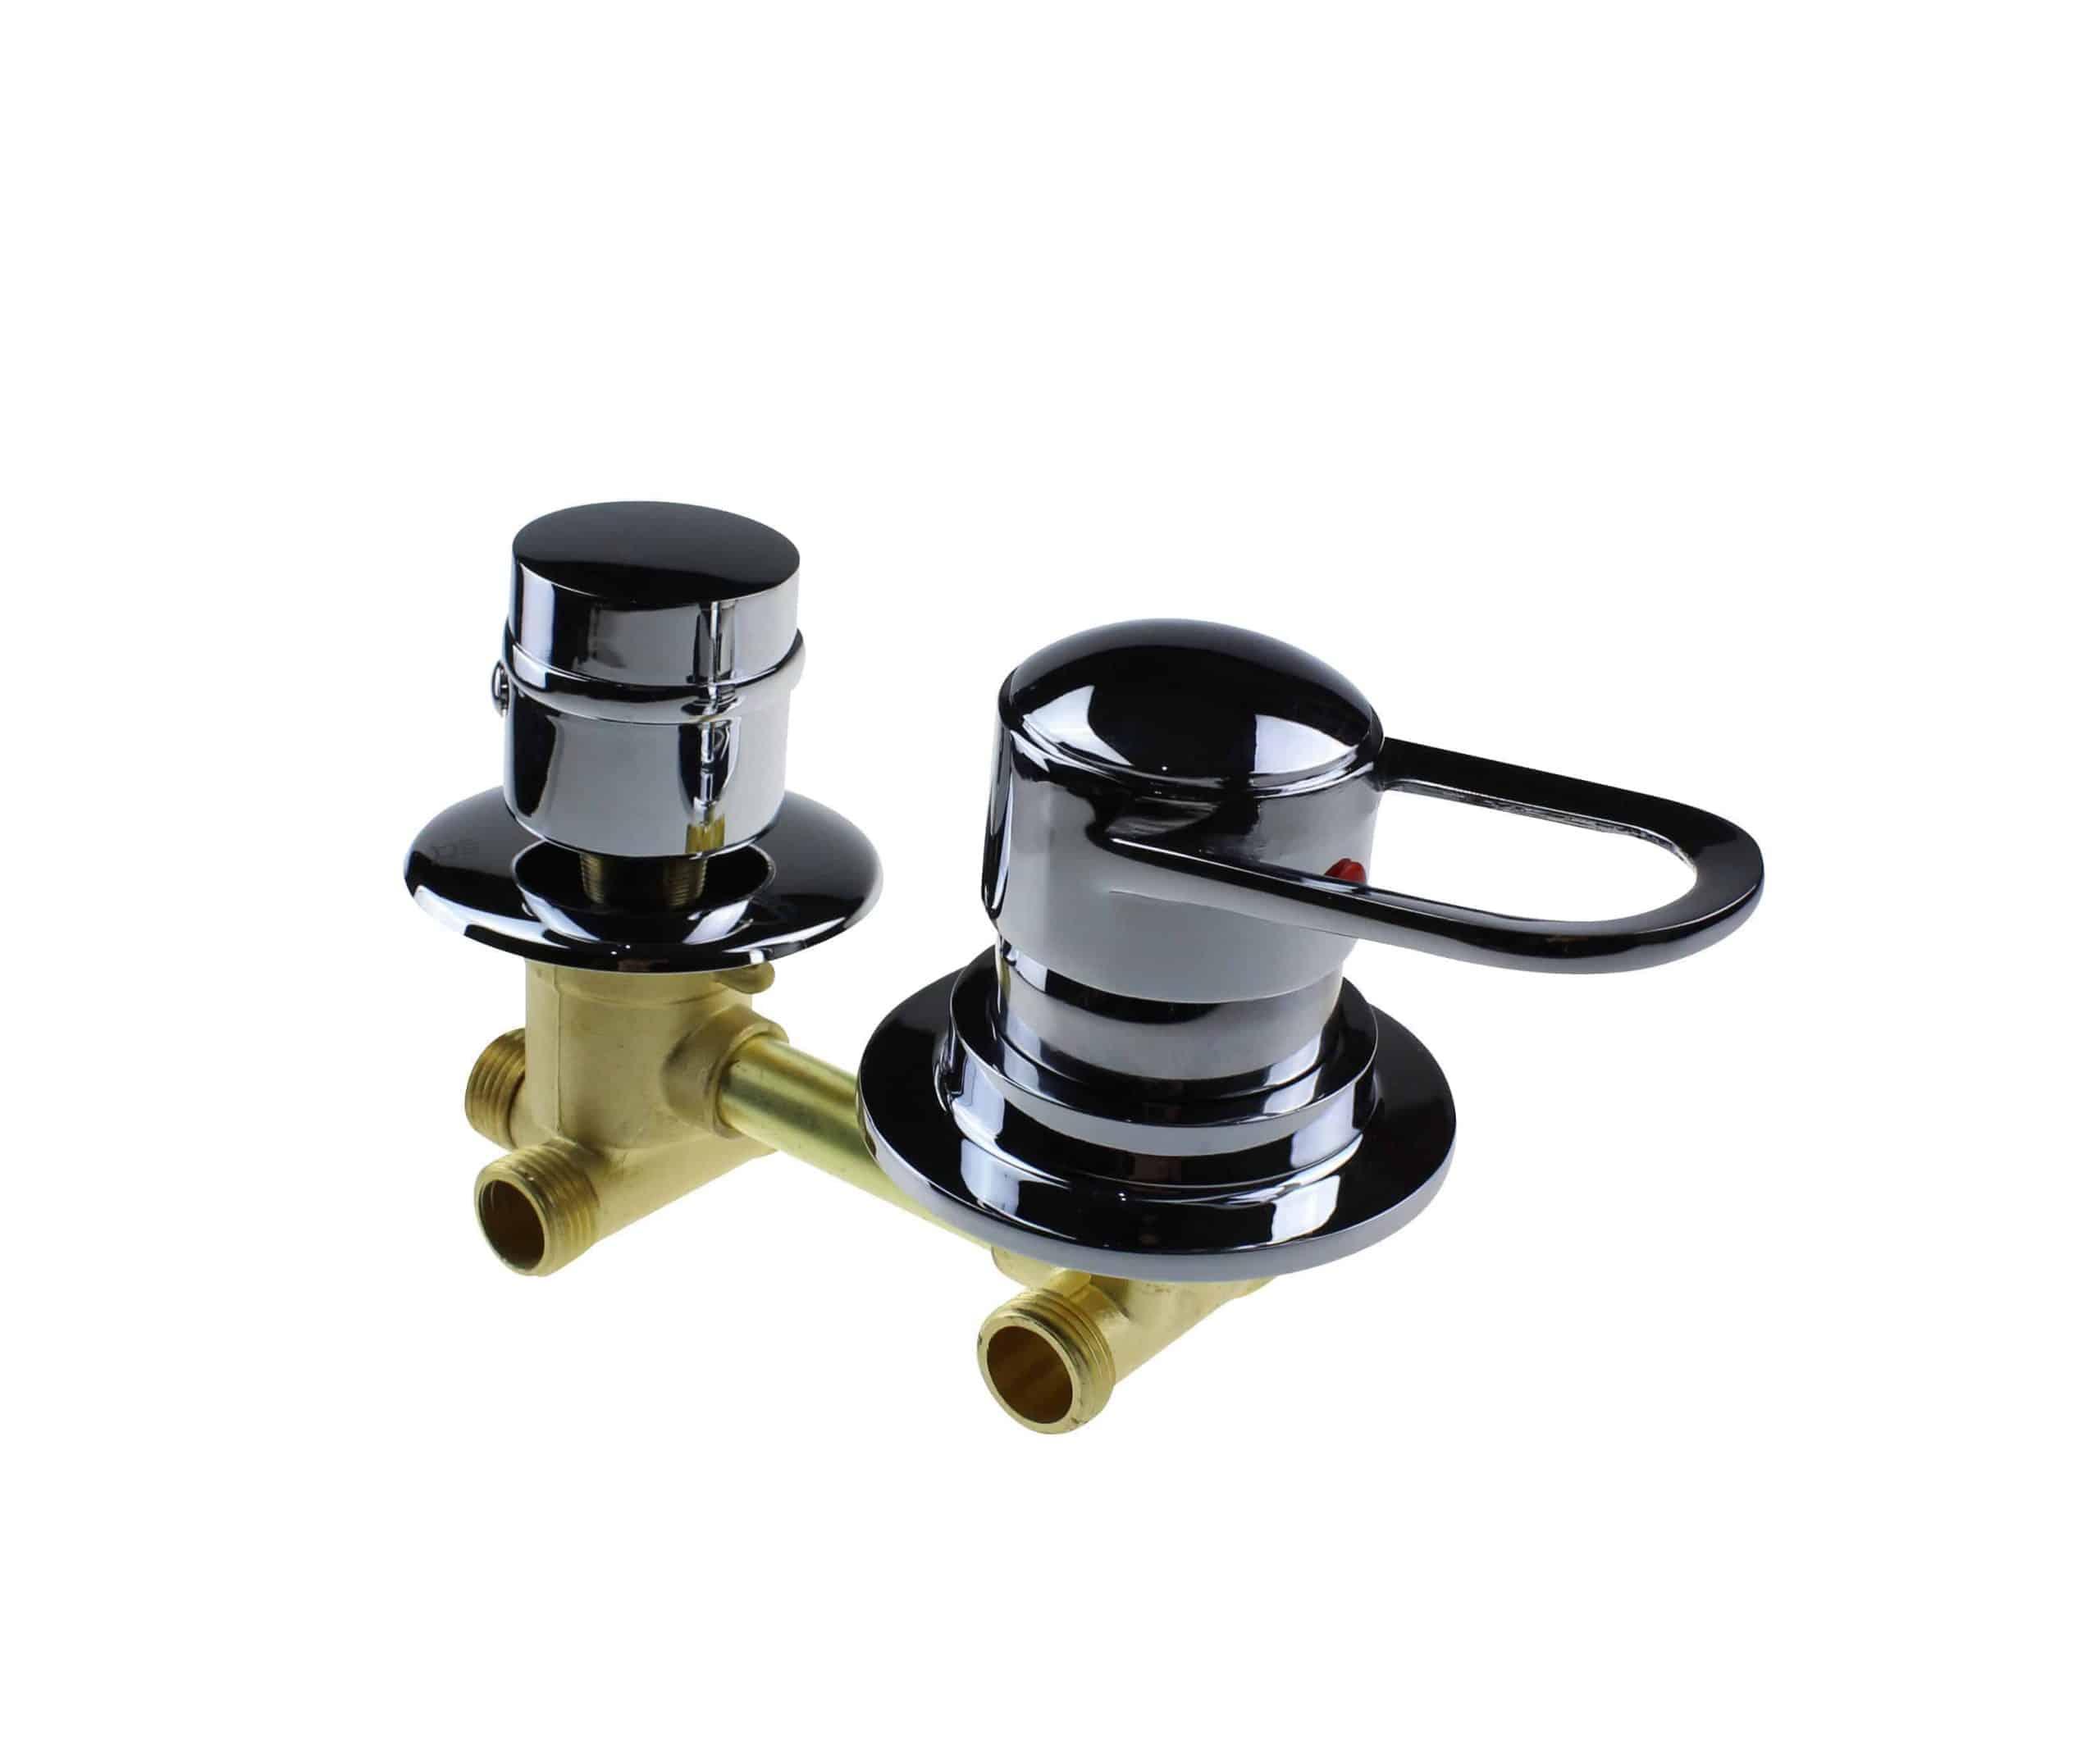 2 Dial Shower Mixer Valve : Threaded 140mm Centres